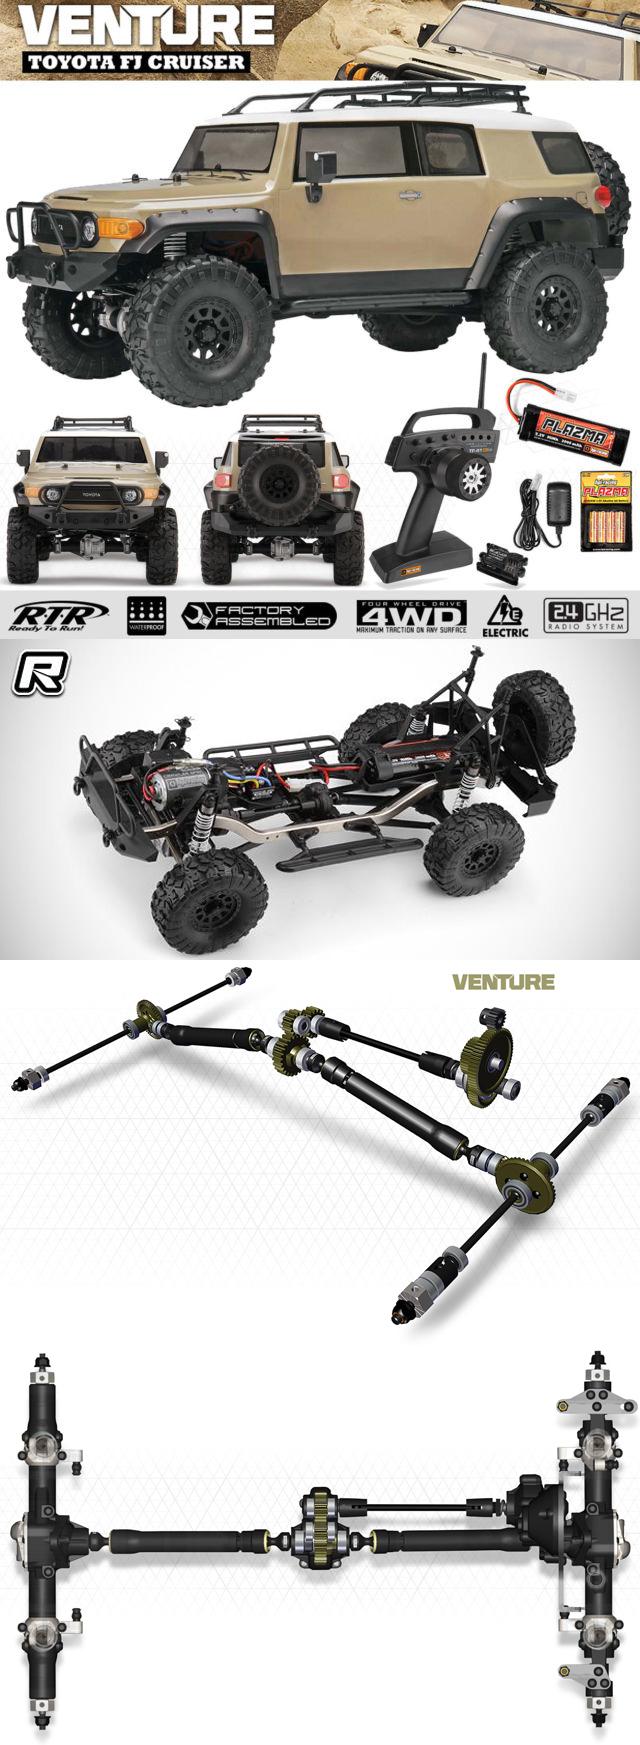 Venture Toyota FJ Cruiser RTR, 1/10 Scale, 4WD, Brushed, Beige, w/ 2.4GHz Radio System